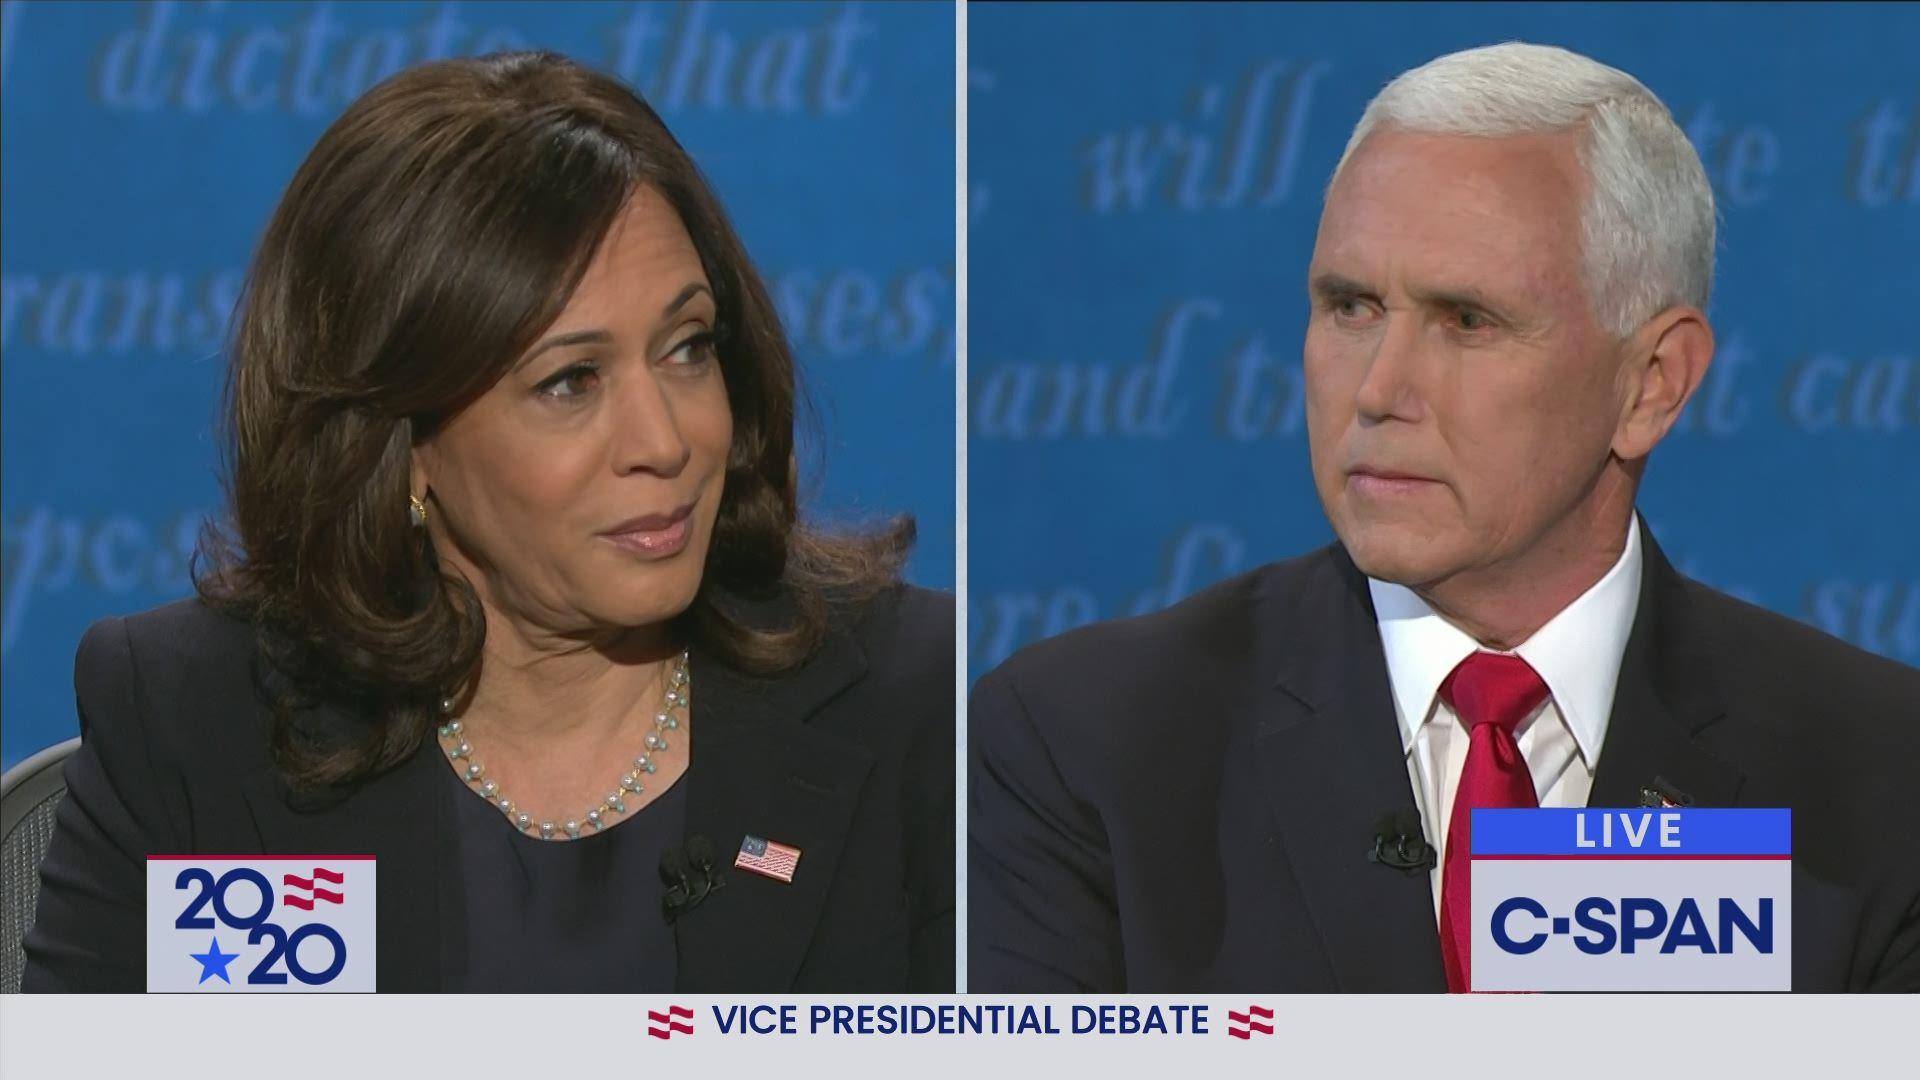 Vice Presidential Candidates Debate C Span Org